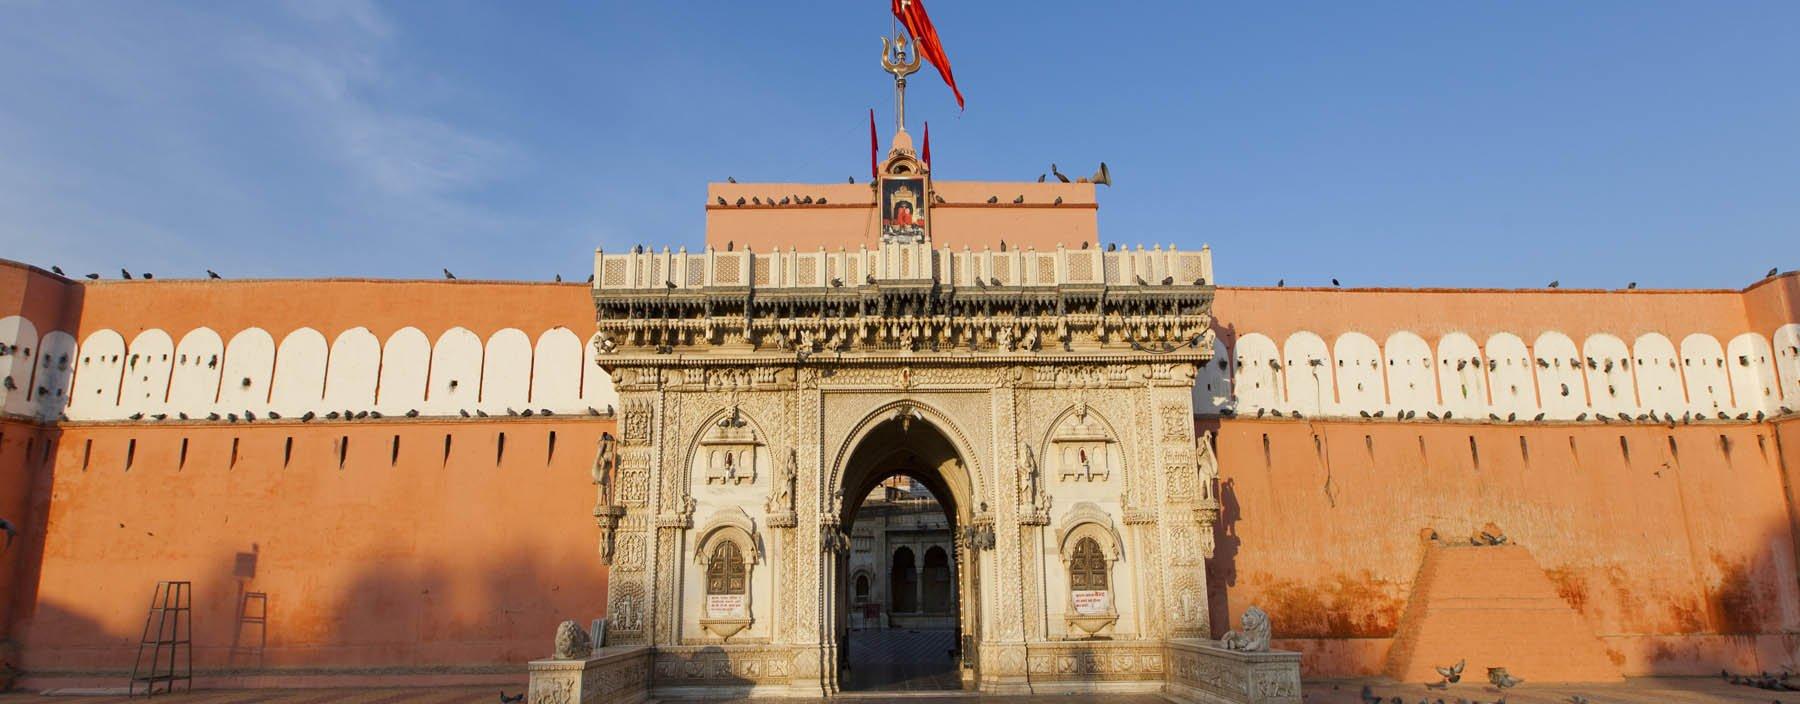 in, bikaner, the rat temple, deshnoke.jpg